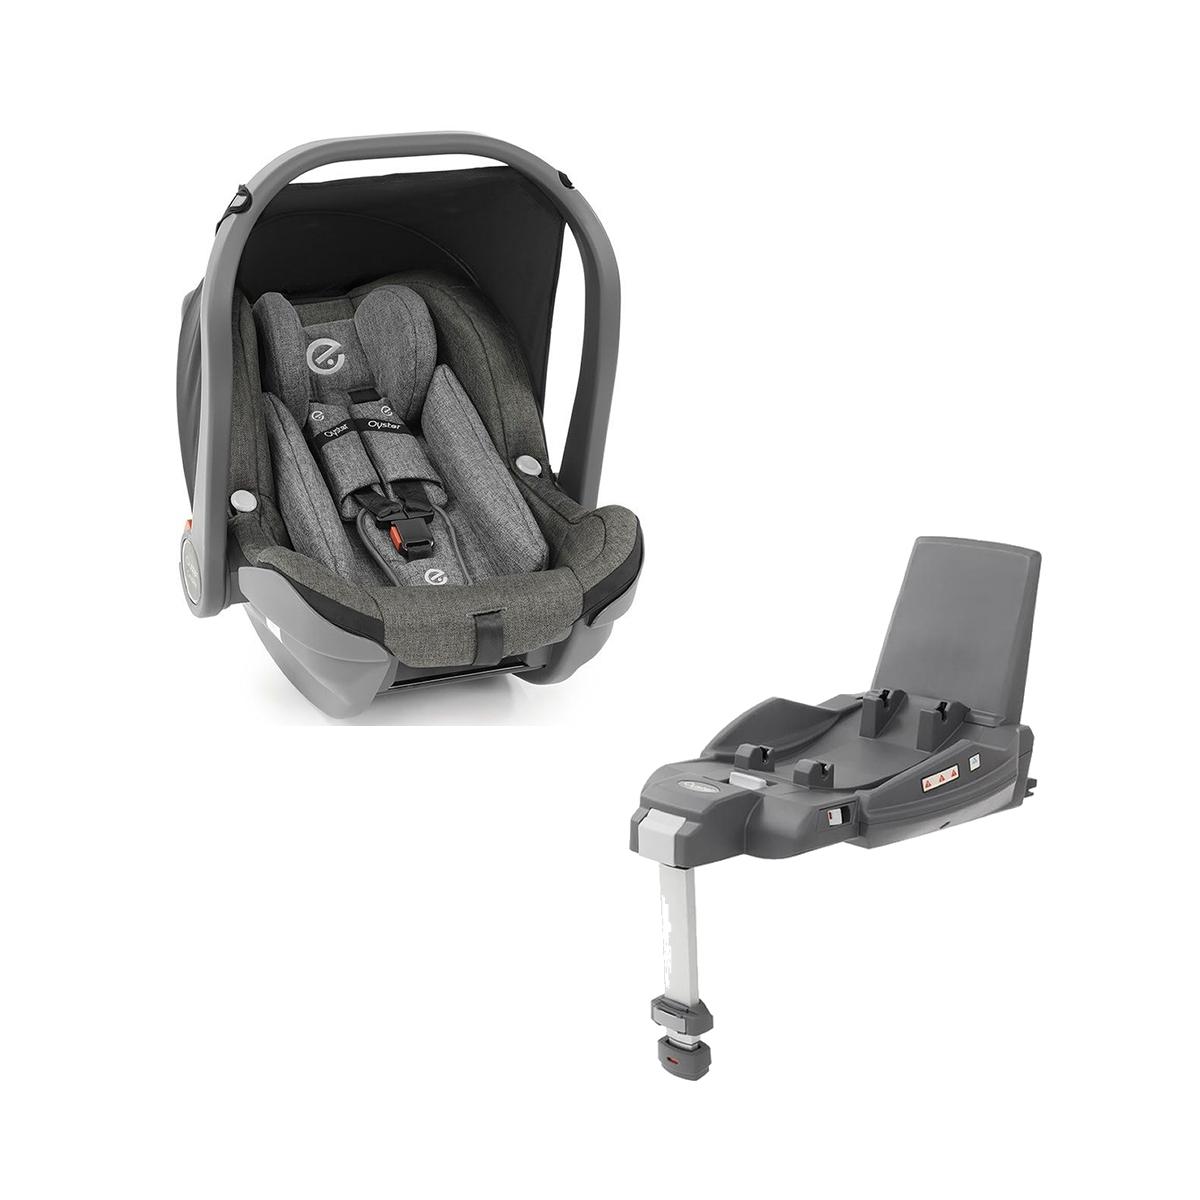 Babystyle Capsule Infant Car Seat & Duofix i-Size Base-Pepper